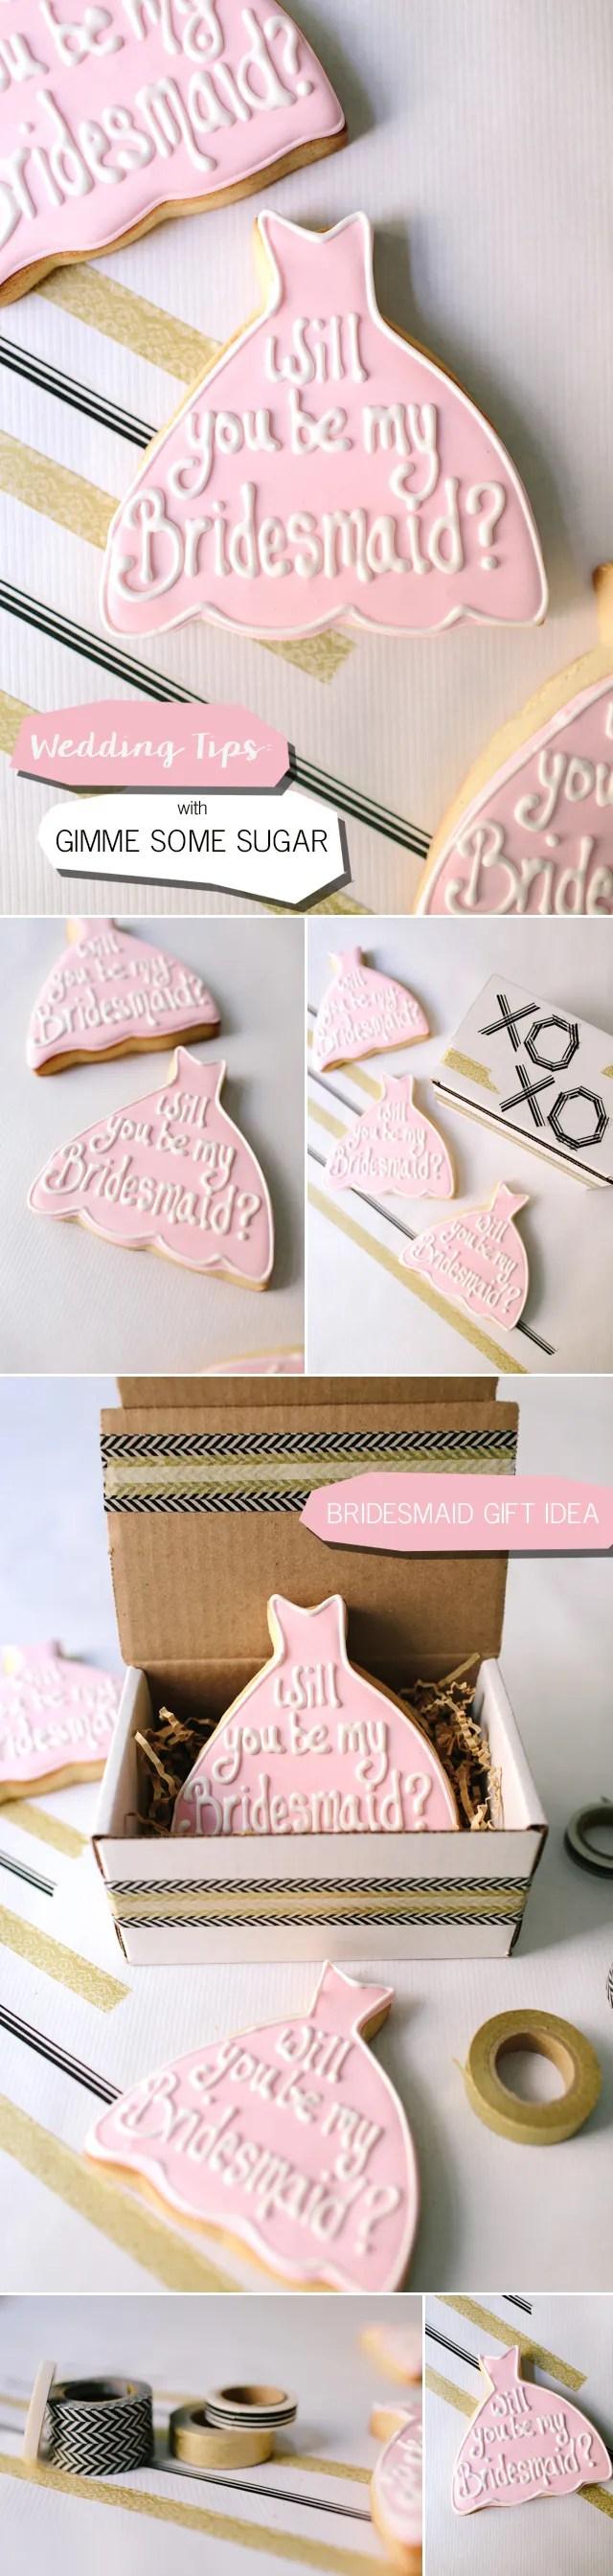 Gimme Some Sugar Cookies Bridesmaid Gift Custom Cookies Las Vegas  | Meg Ruth Photo | Bridesmaid Gift | Will You Be My Bridesmaid Cookies | Creative Bridesmaid Gift